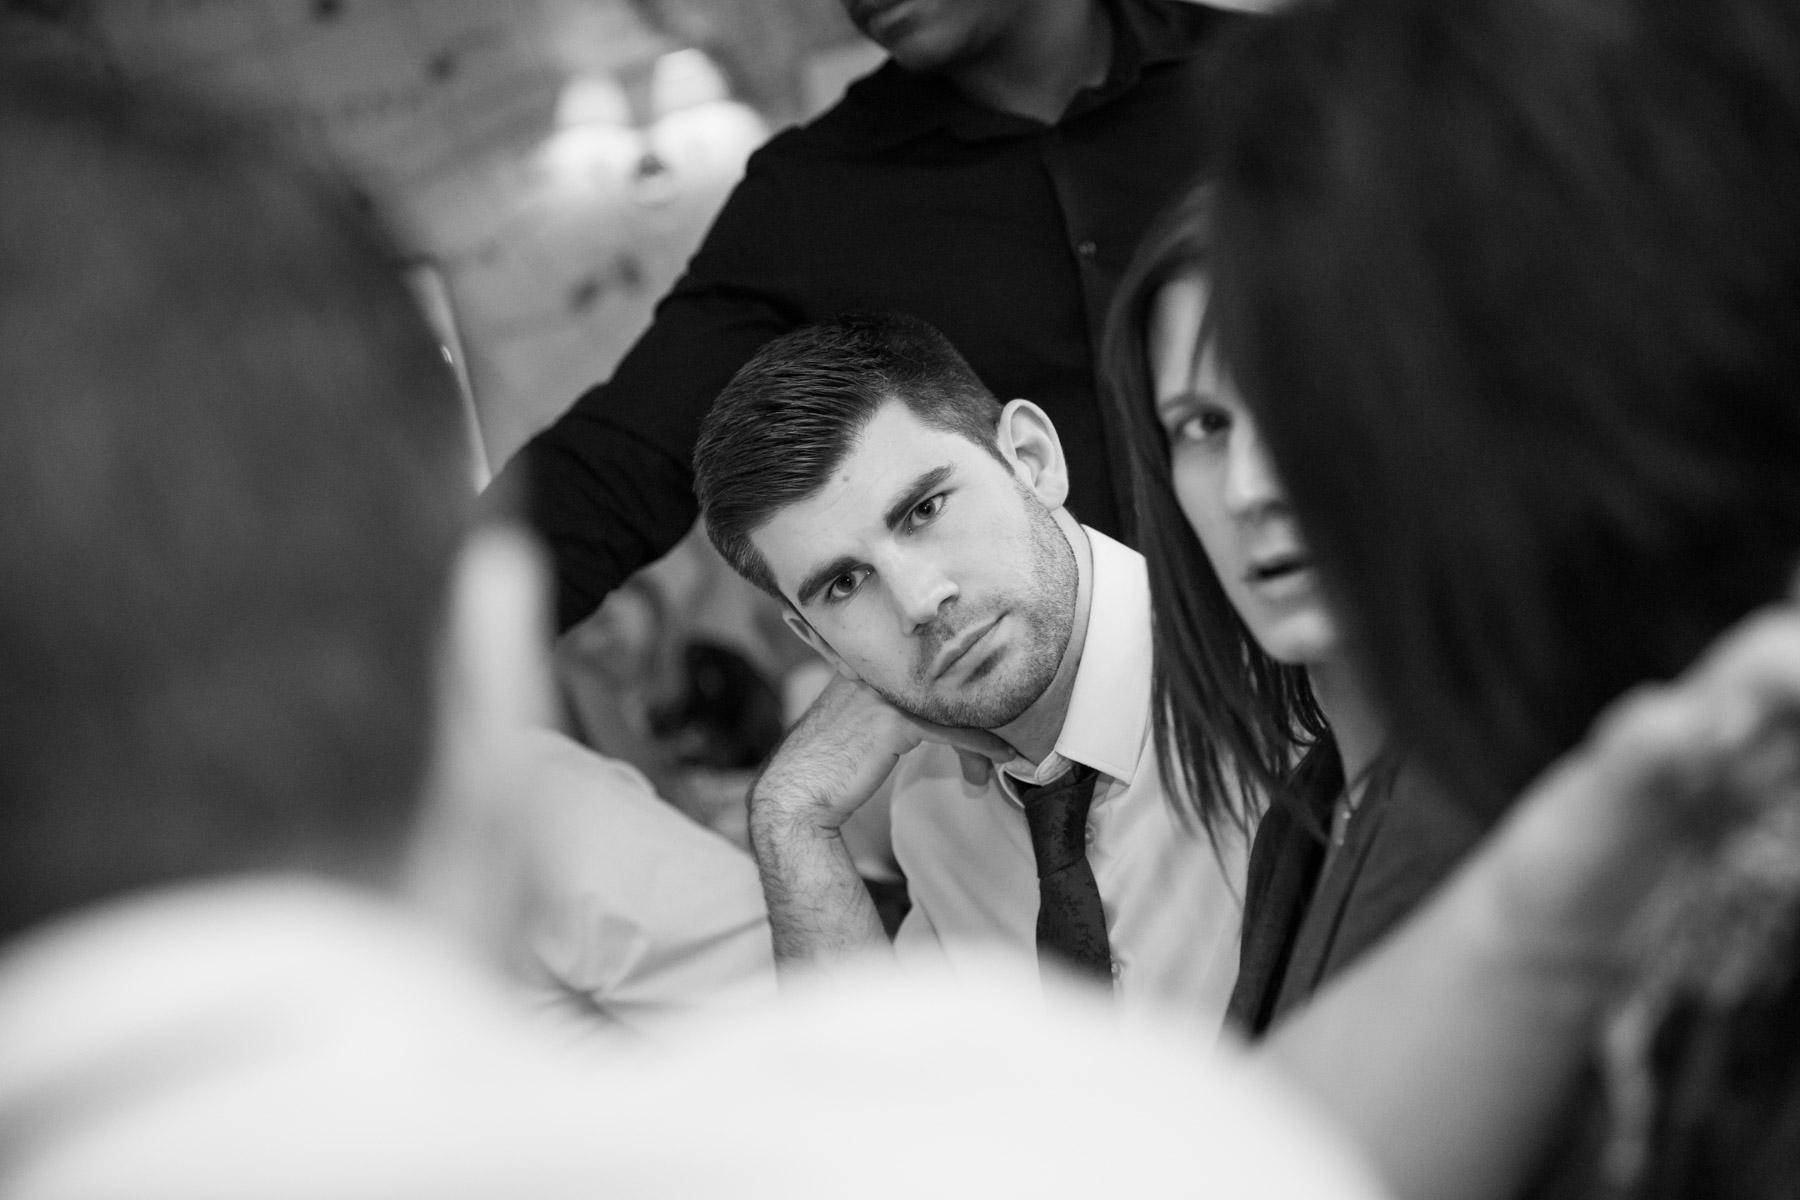 Mews of Mayfair Wedding Photographer - Richard Murgatroyd Photography